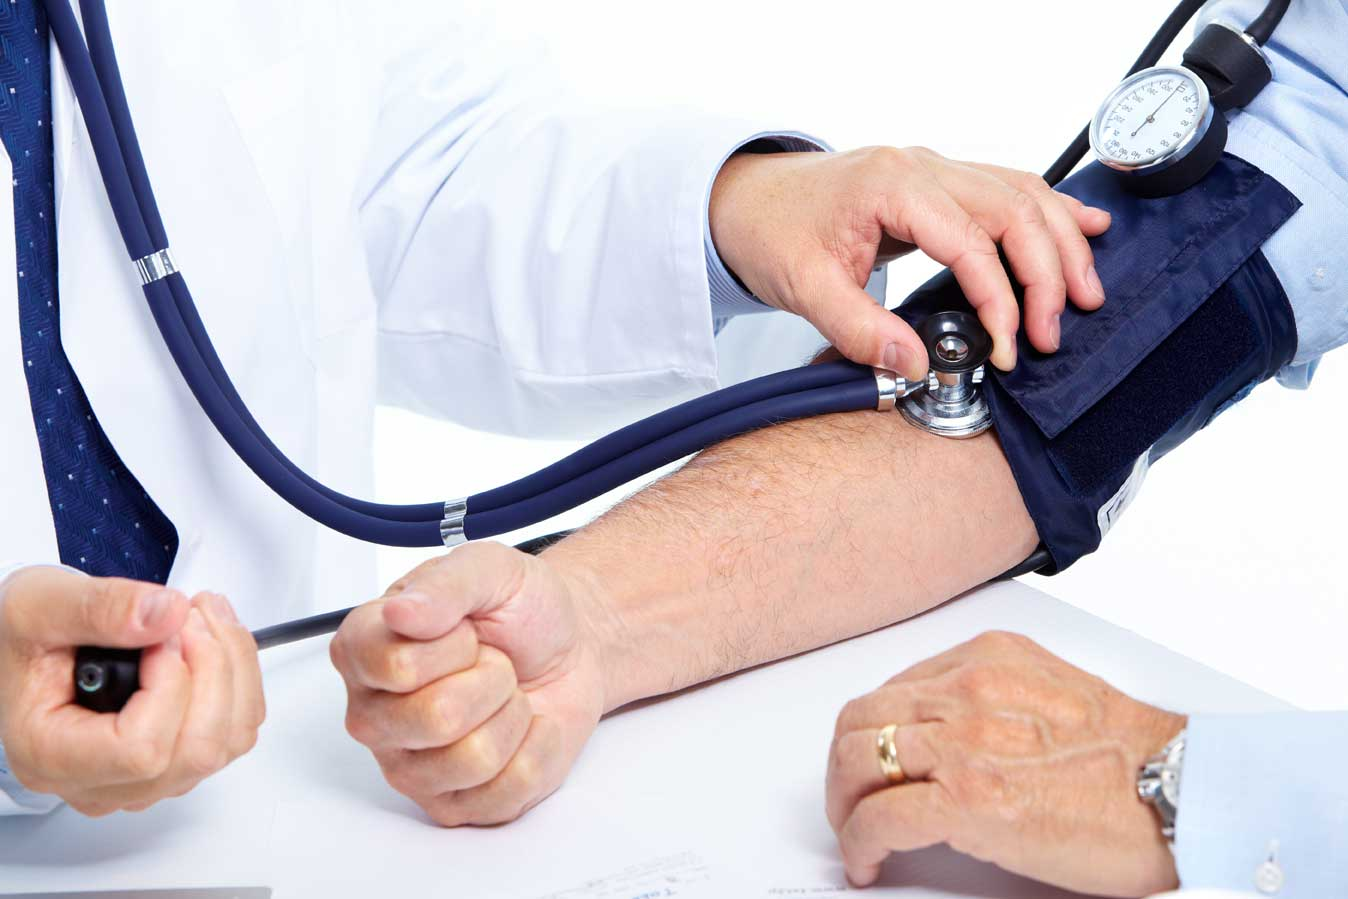 आरोग्य तपासणी साठी इमेज परिणाम